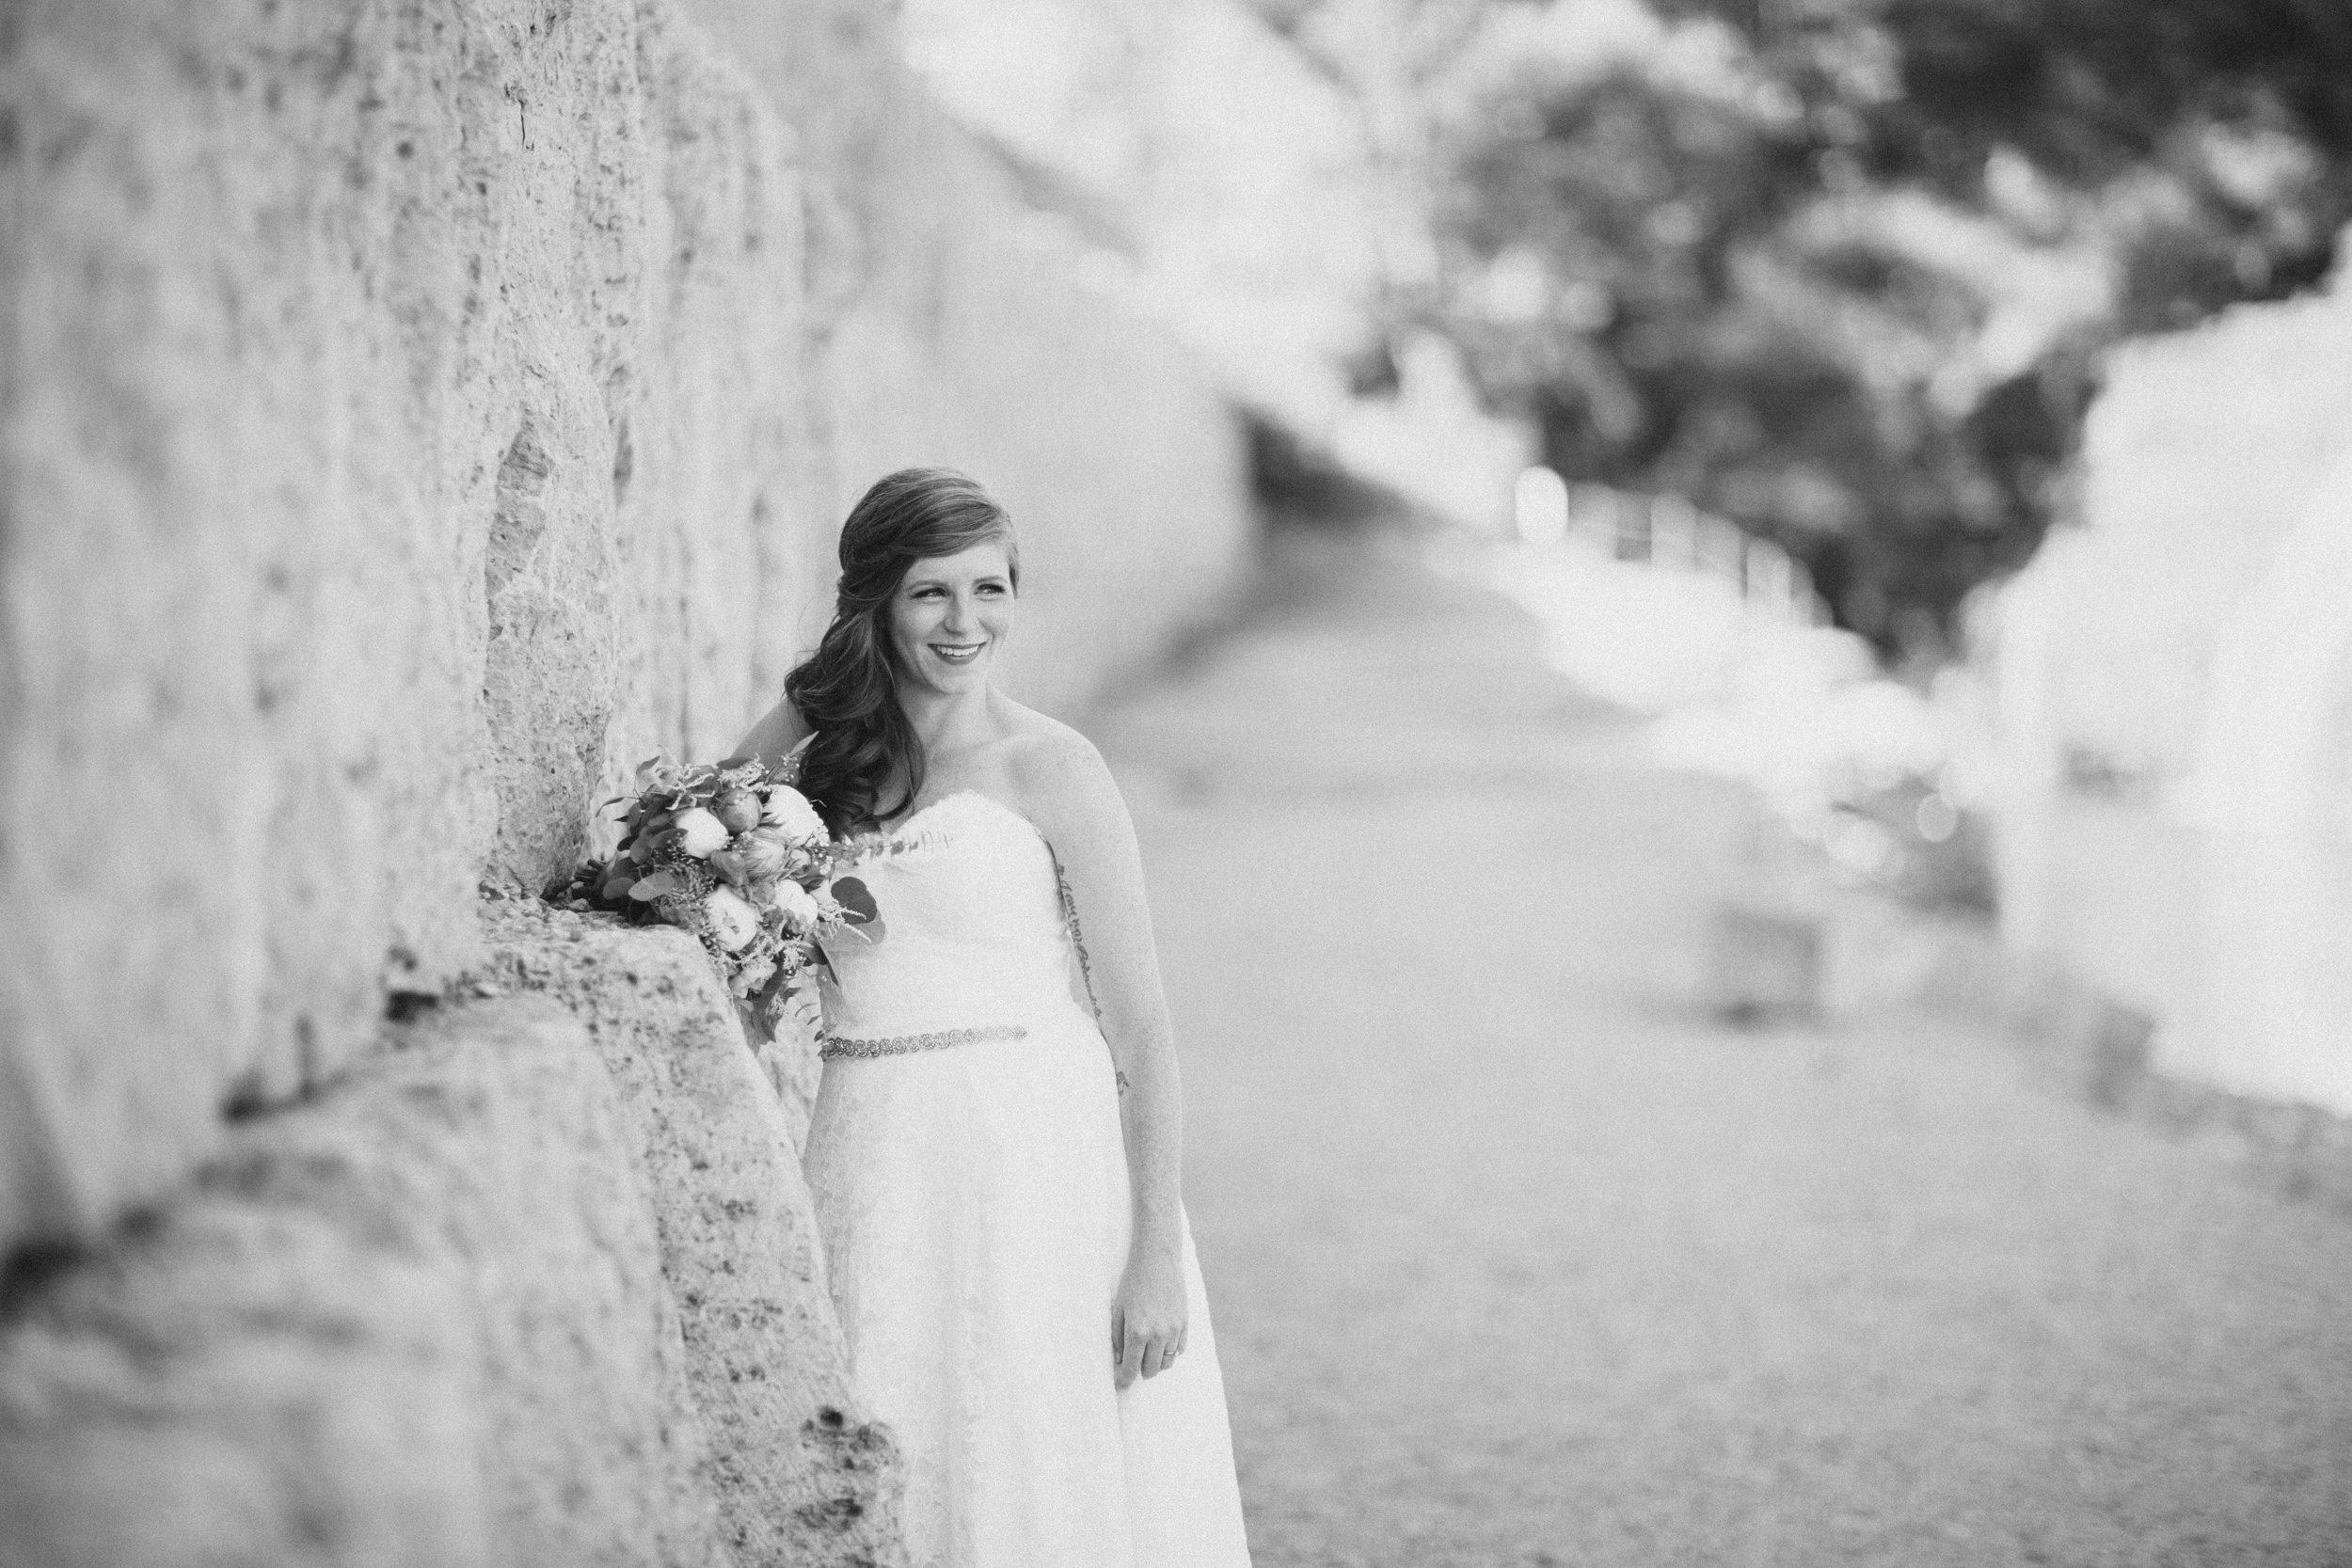 7-25-2015 Sarah and Jimmy's Eagle Ridge Downtown Galena Wedding-162.jpg